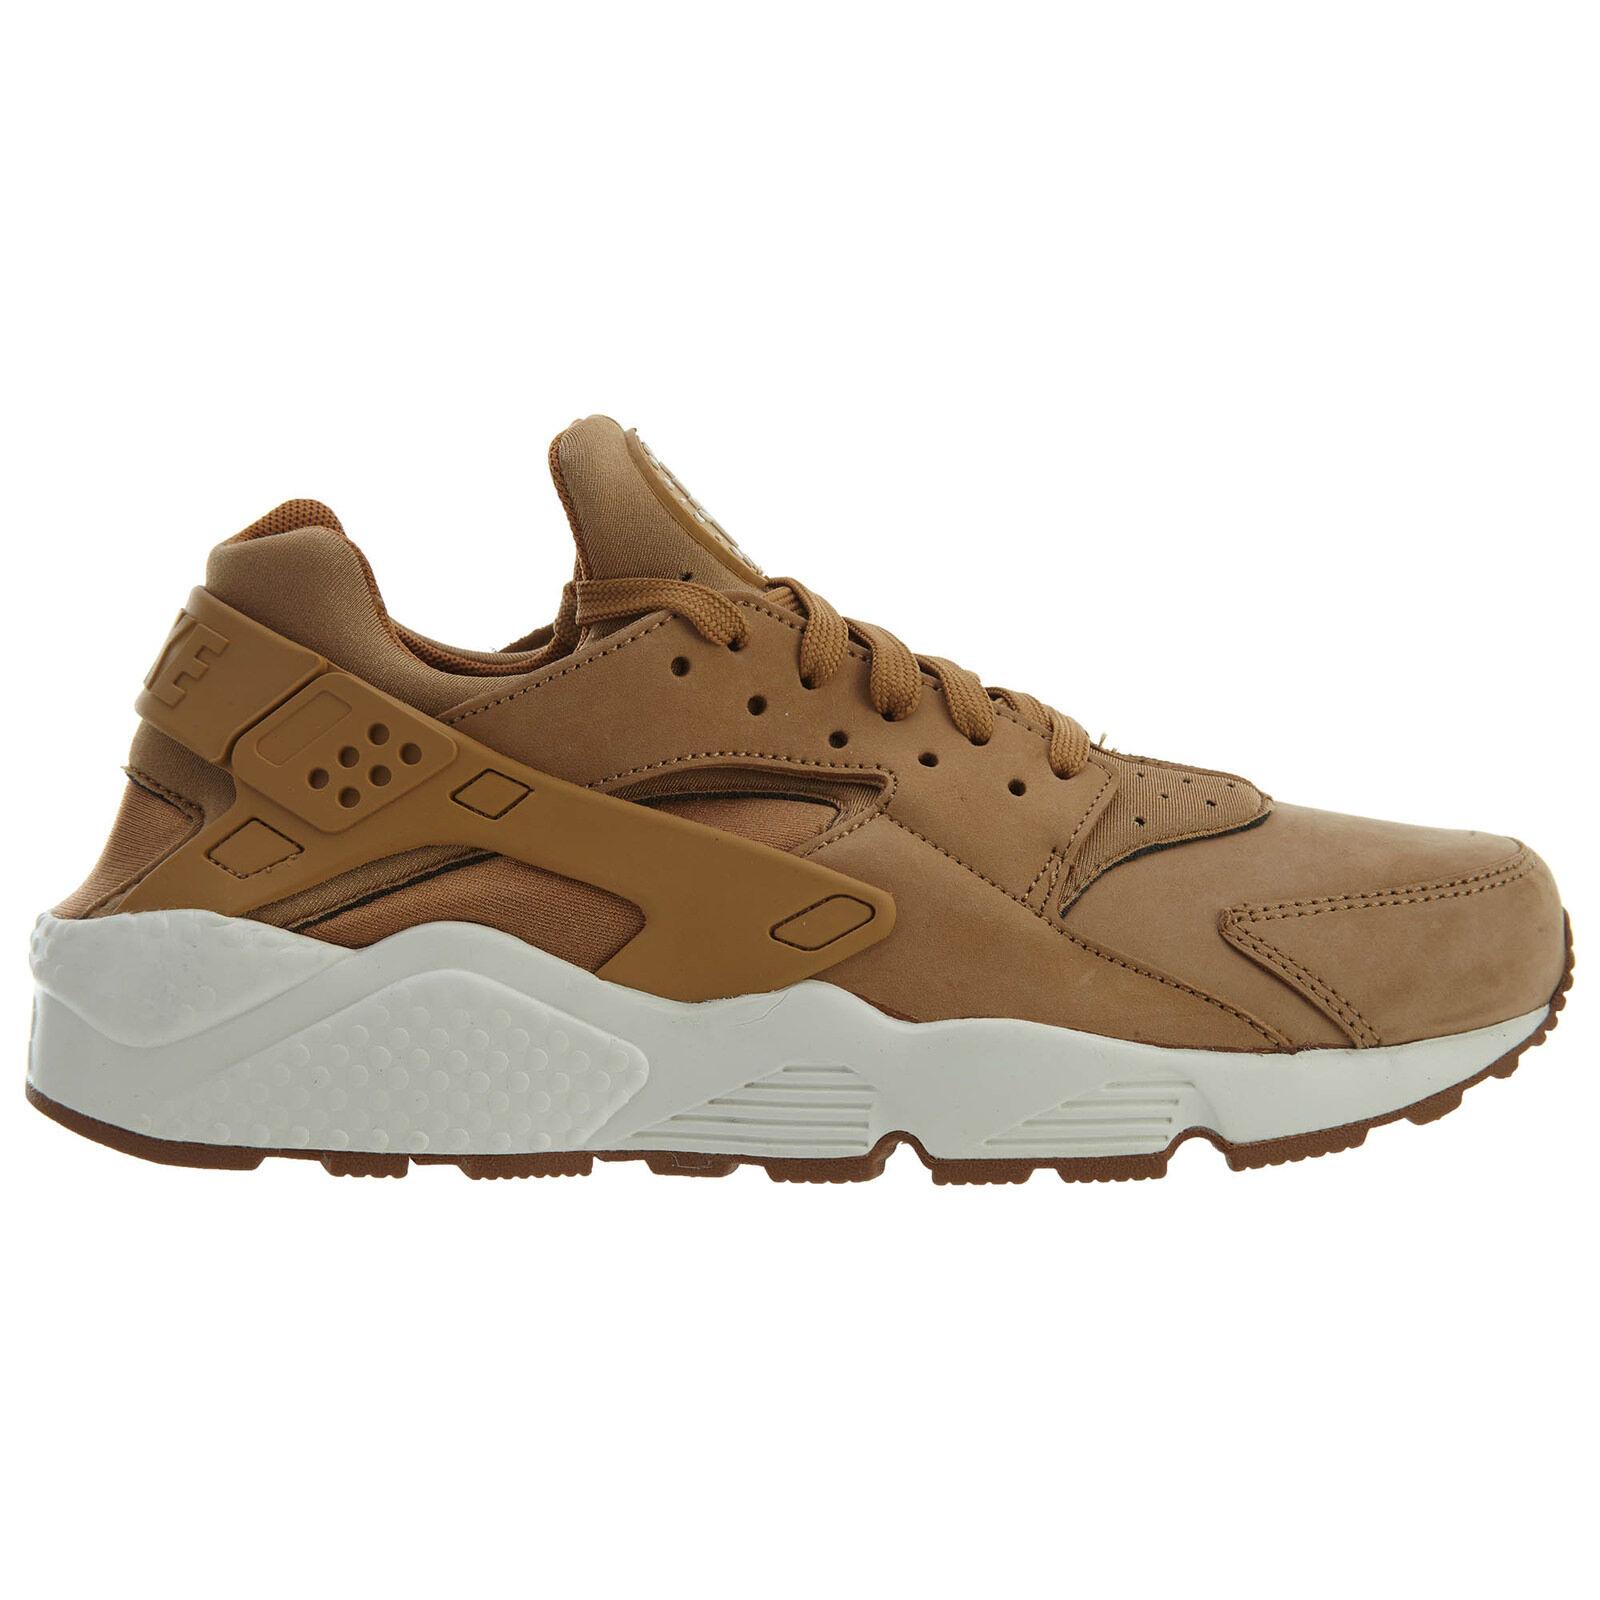 Nike air huarache Uomo 318429-202 lino vela gomma brown scarpe taglia 10